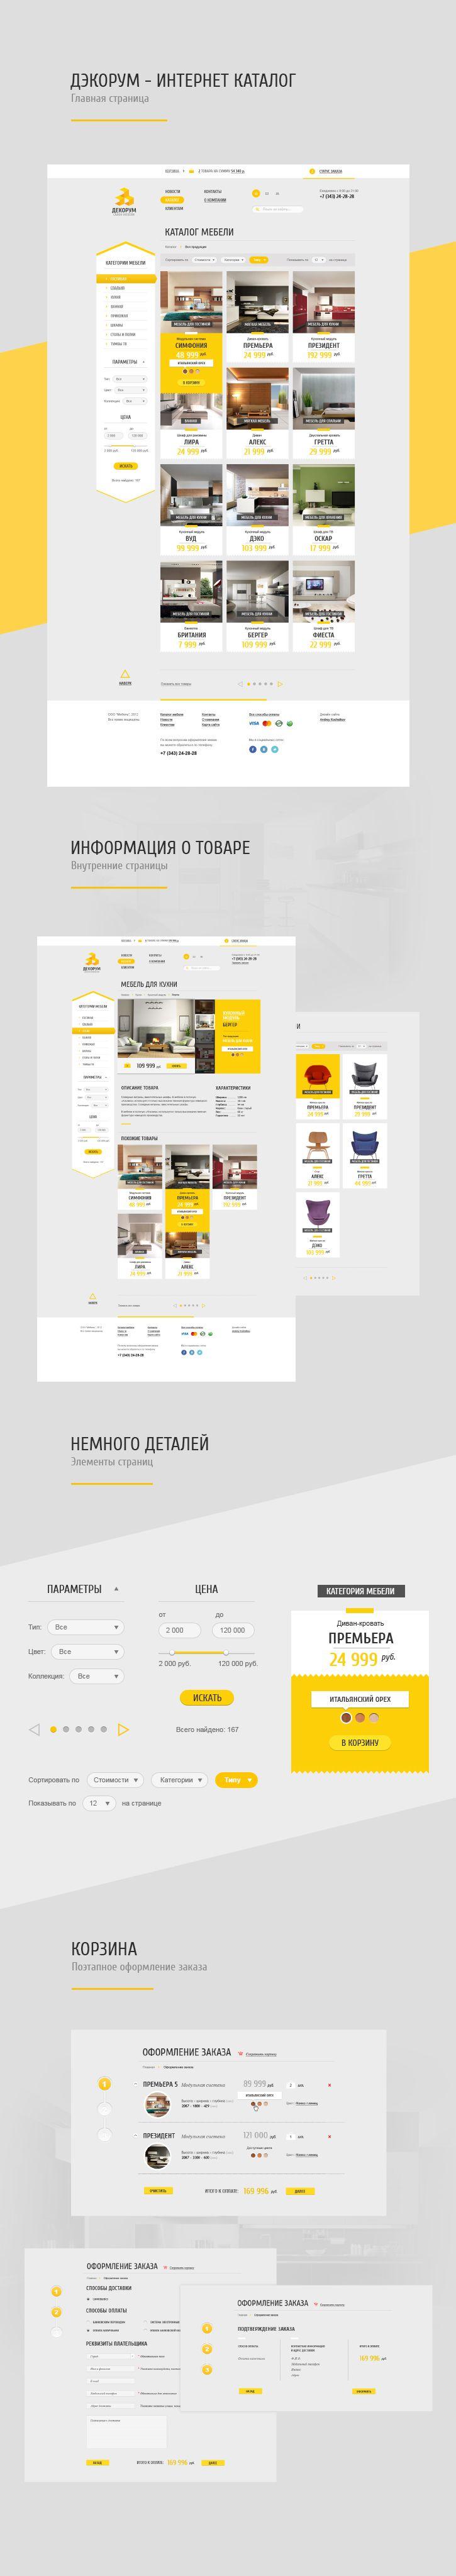 Decoroom - Web design (old work) by Andrey Kochetkov